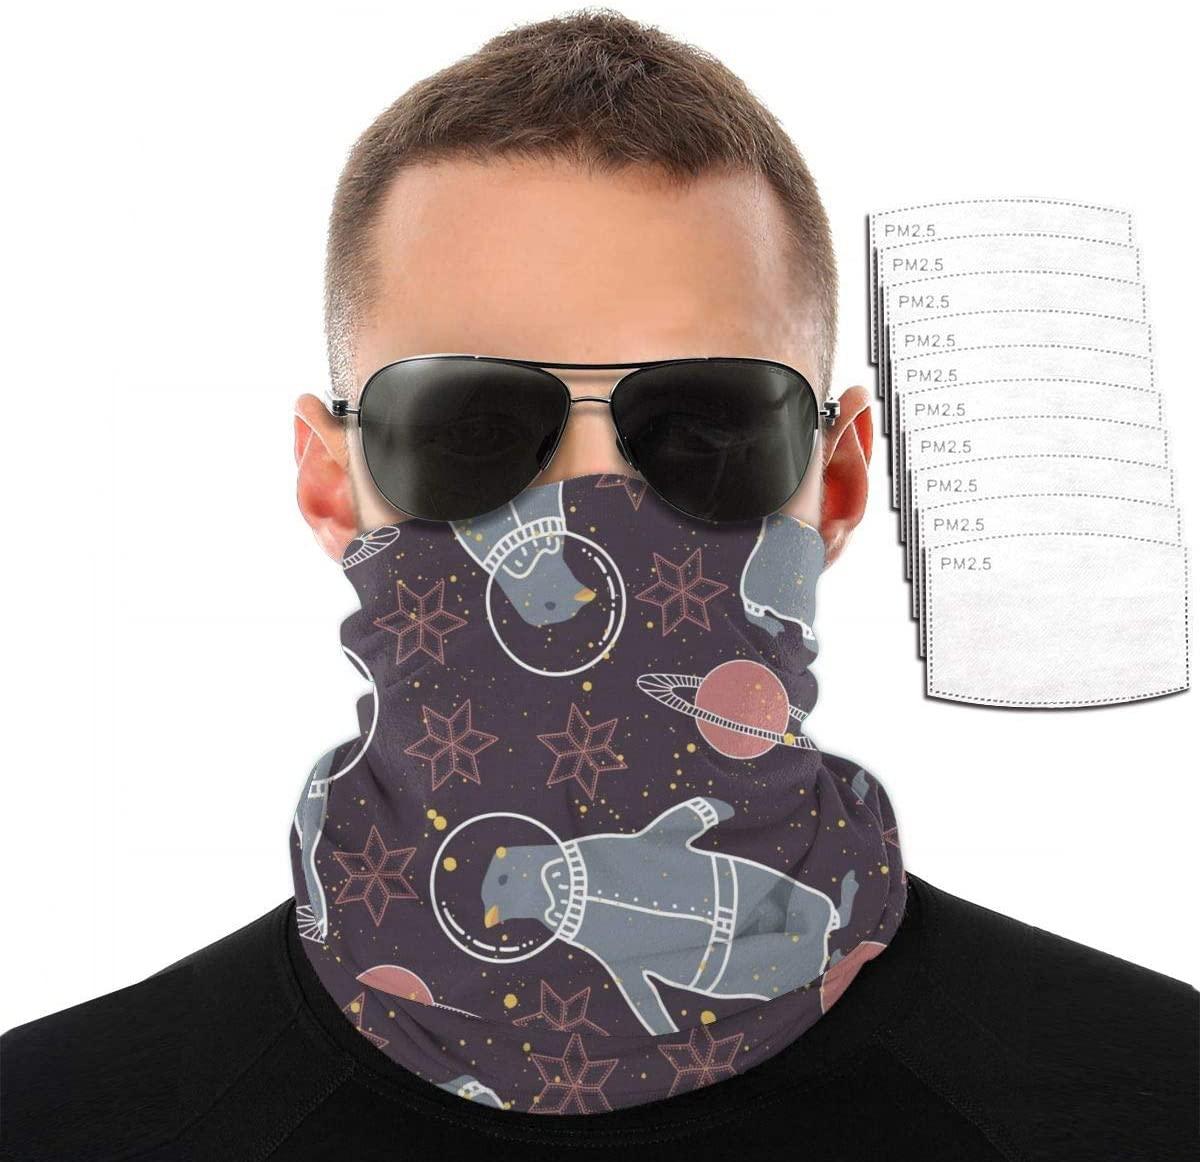 Headwear Unisex Hexagonal Star Penguin Variety Face Towel Headbands Insert Carbon Filter Bandana Neck Gaiter Face Protector For Dust Outdoors